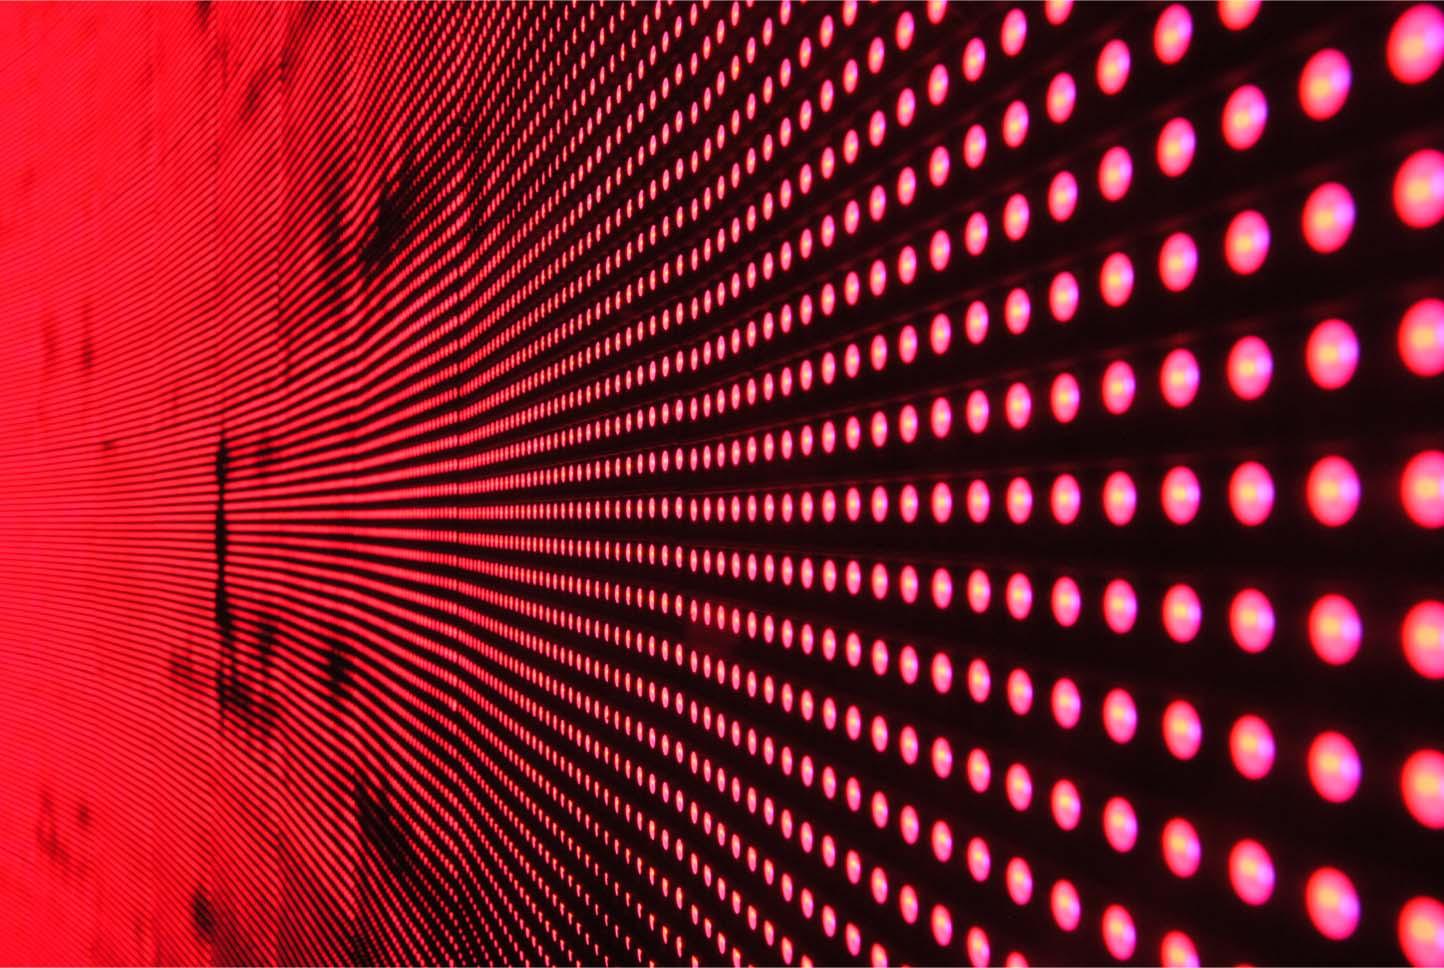 LED Screen image